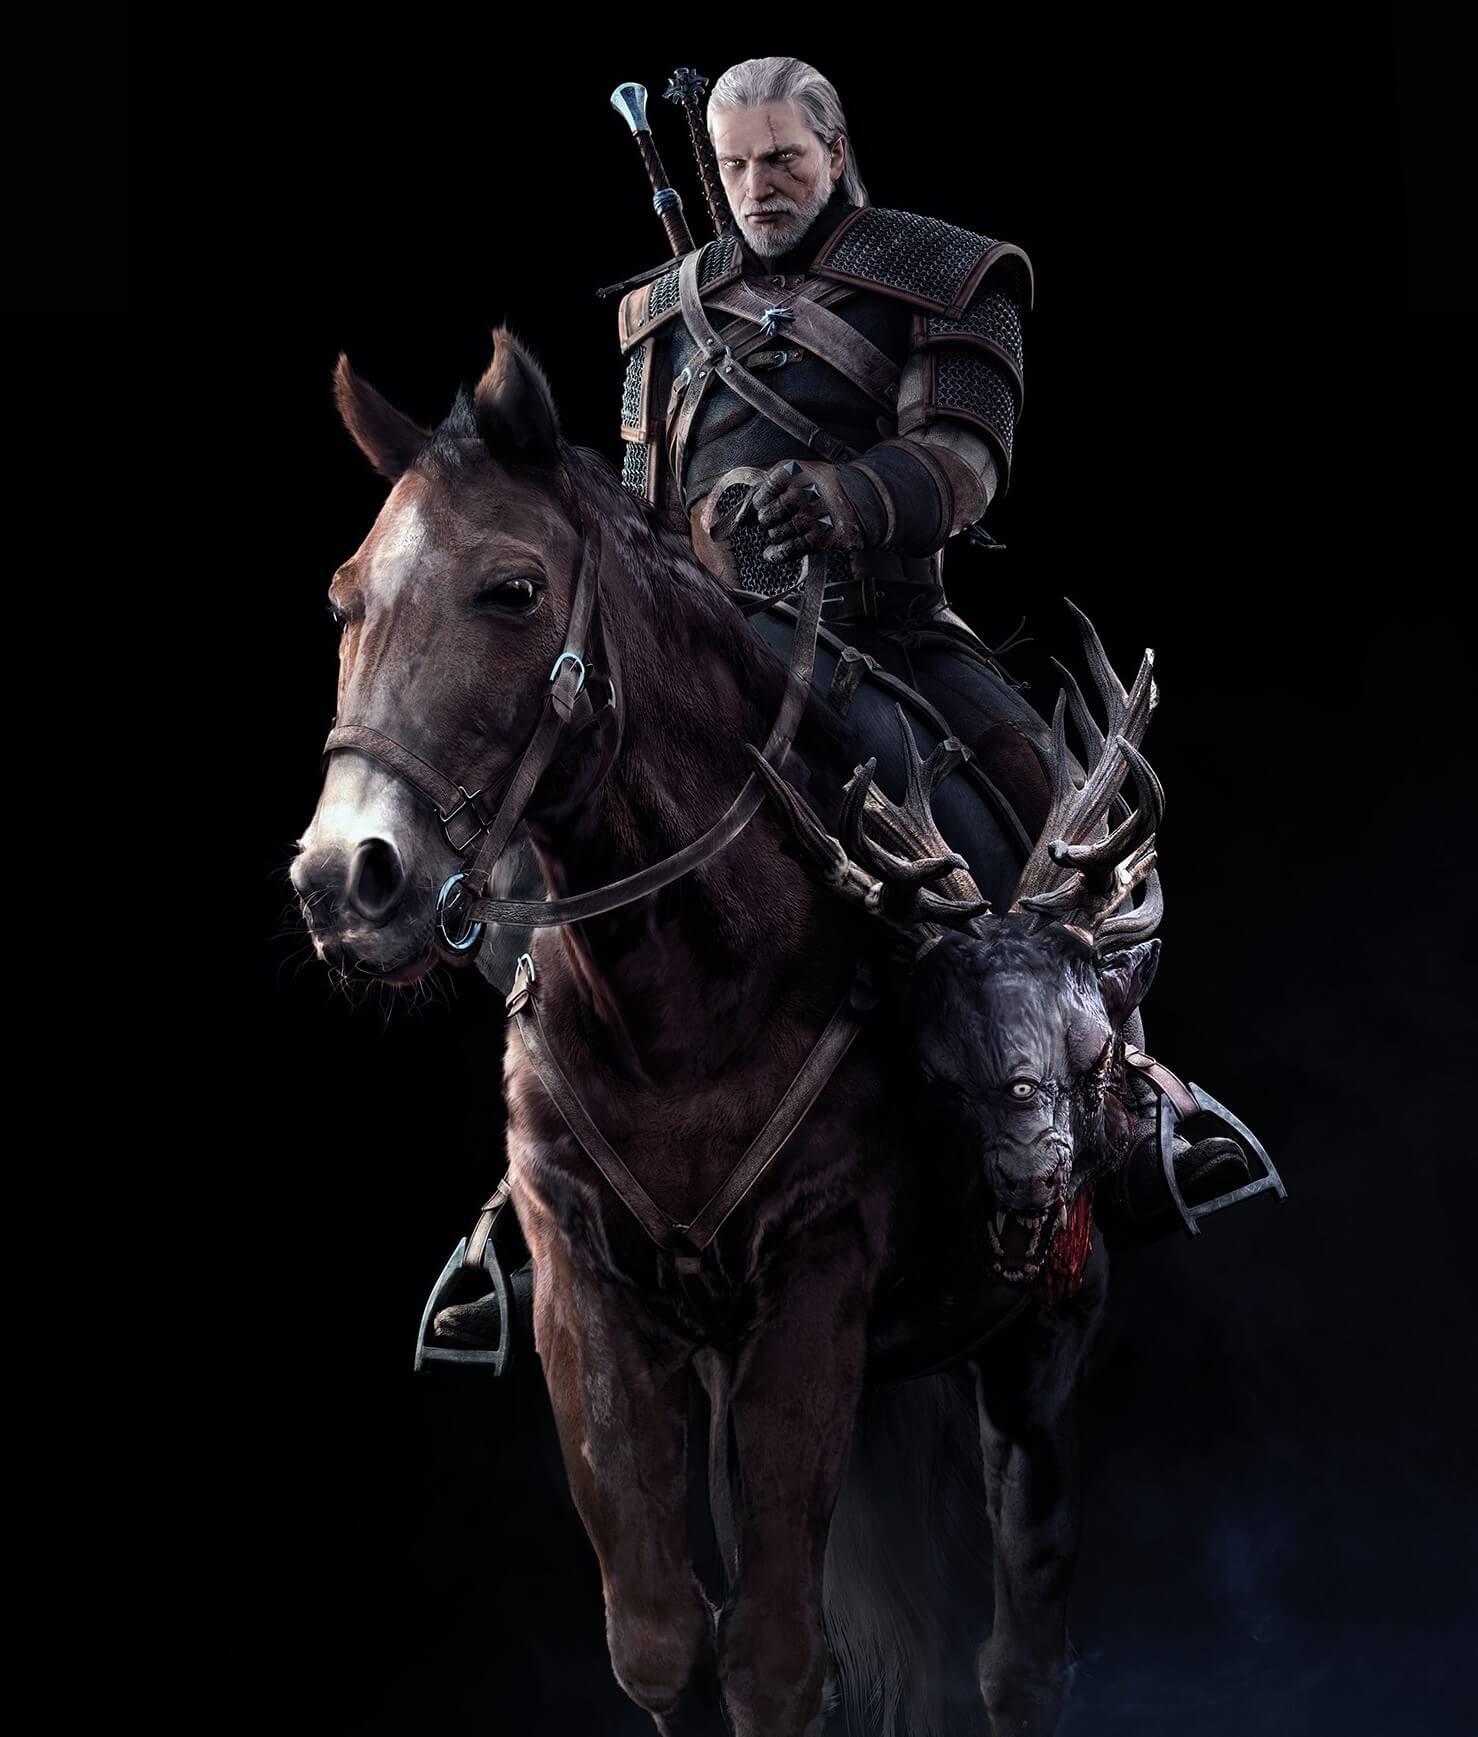 The Witcher 3: Wild Hunt Geralt Promo Art